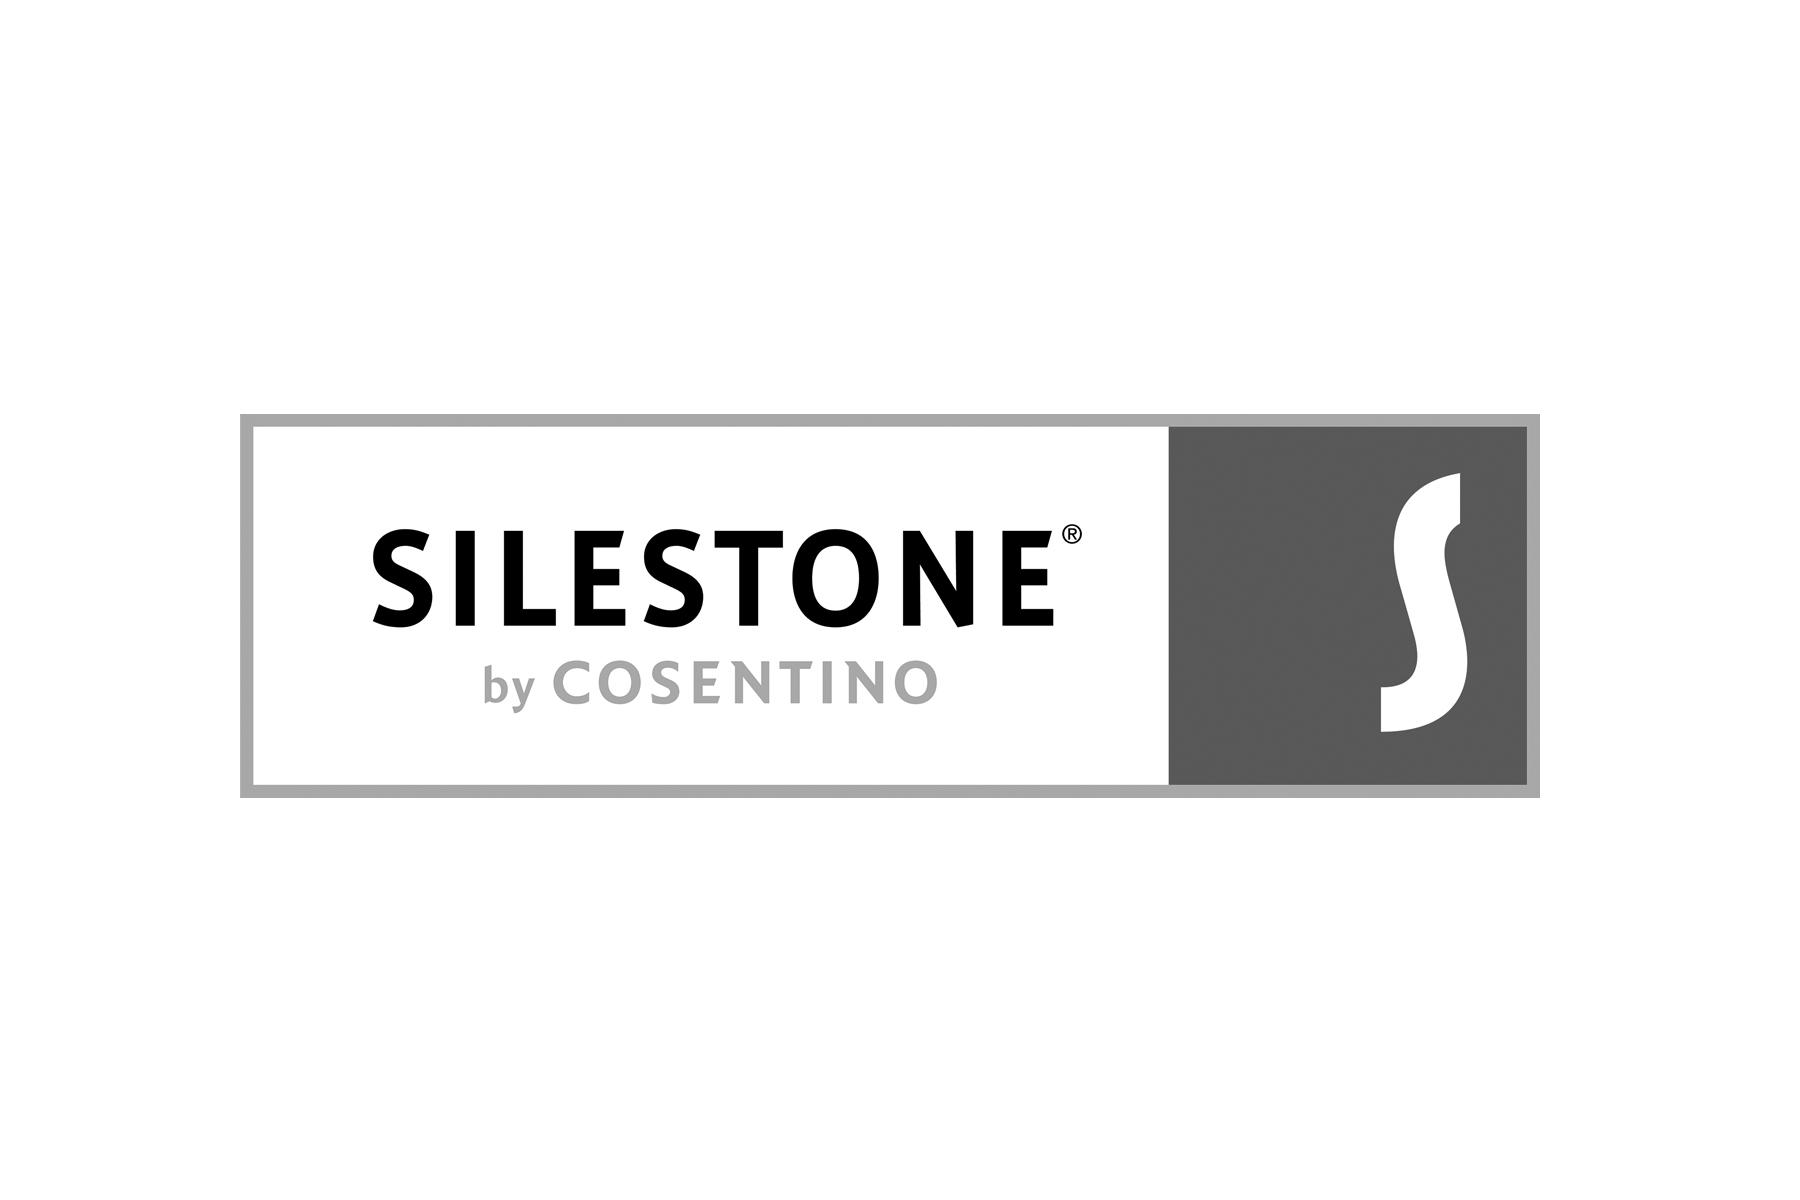 Silestone GS.jpg